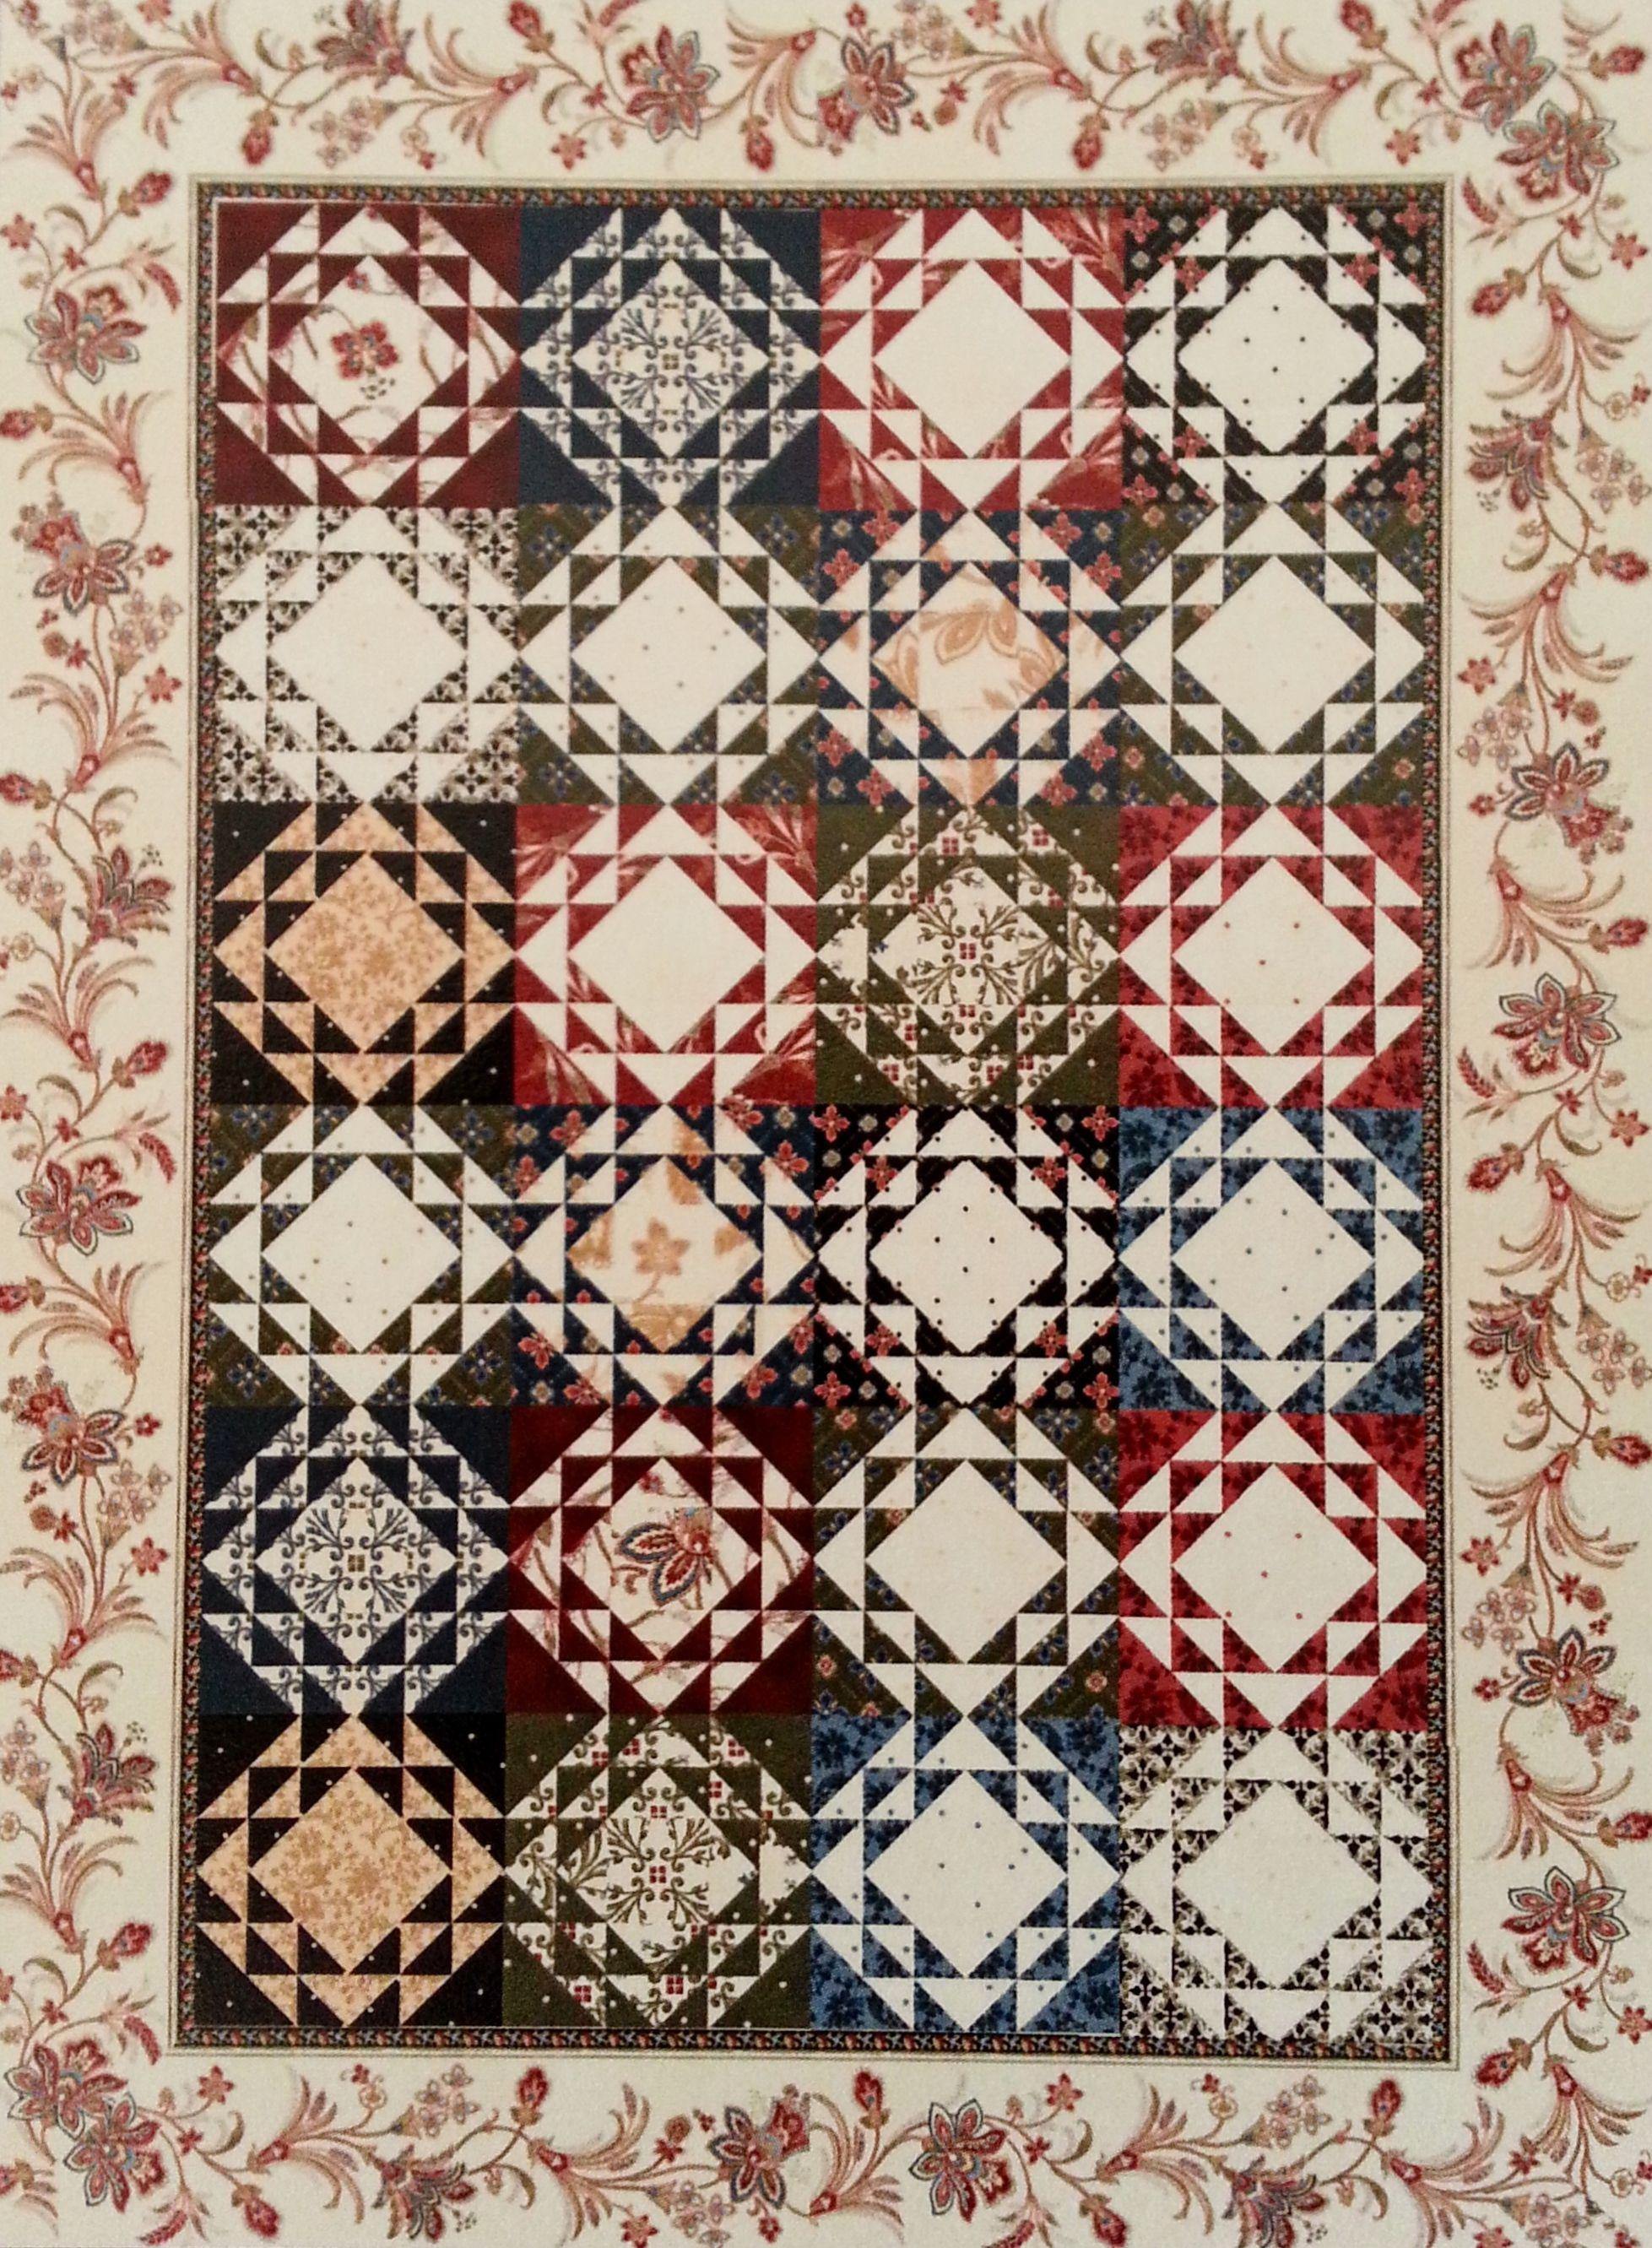 Open Gate Quilts Echo Quilt Patterns Amp Kits Quilt